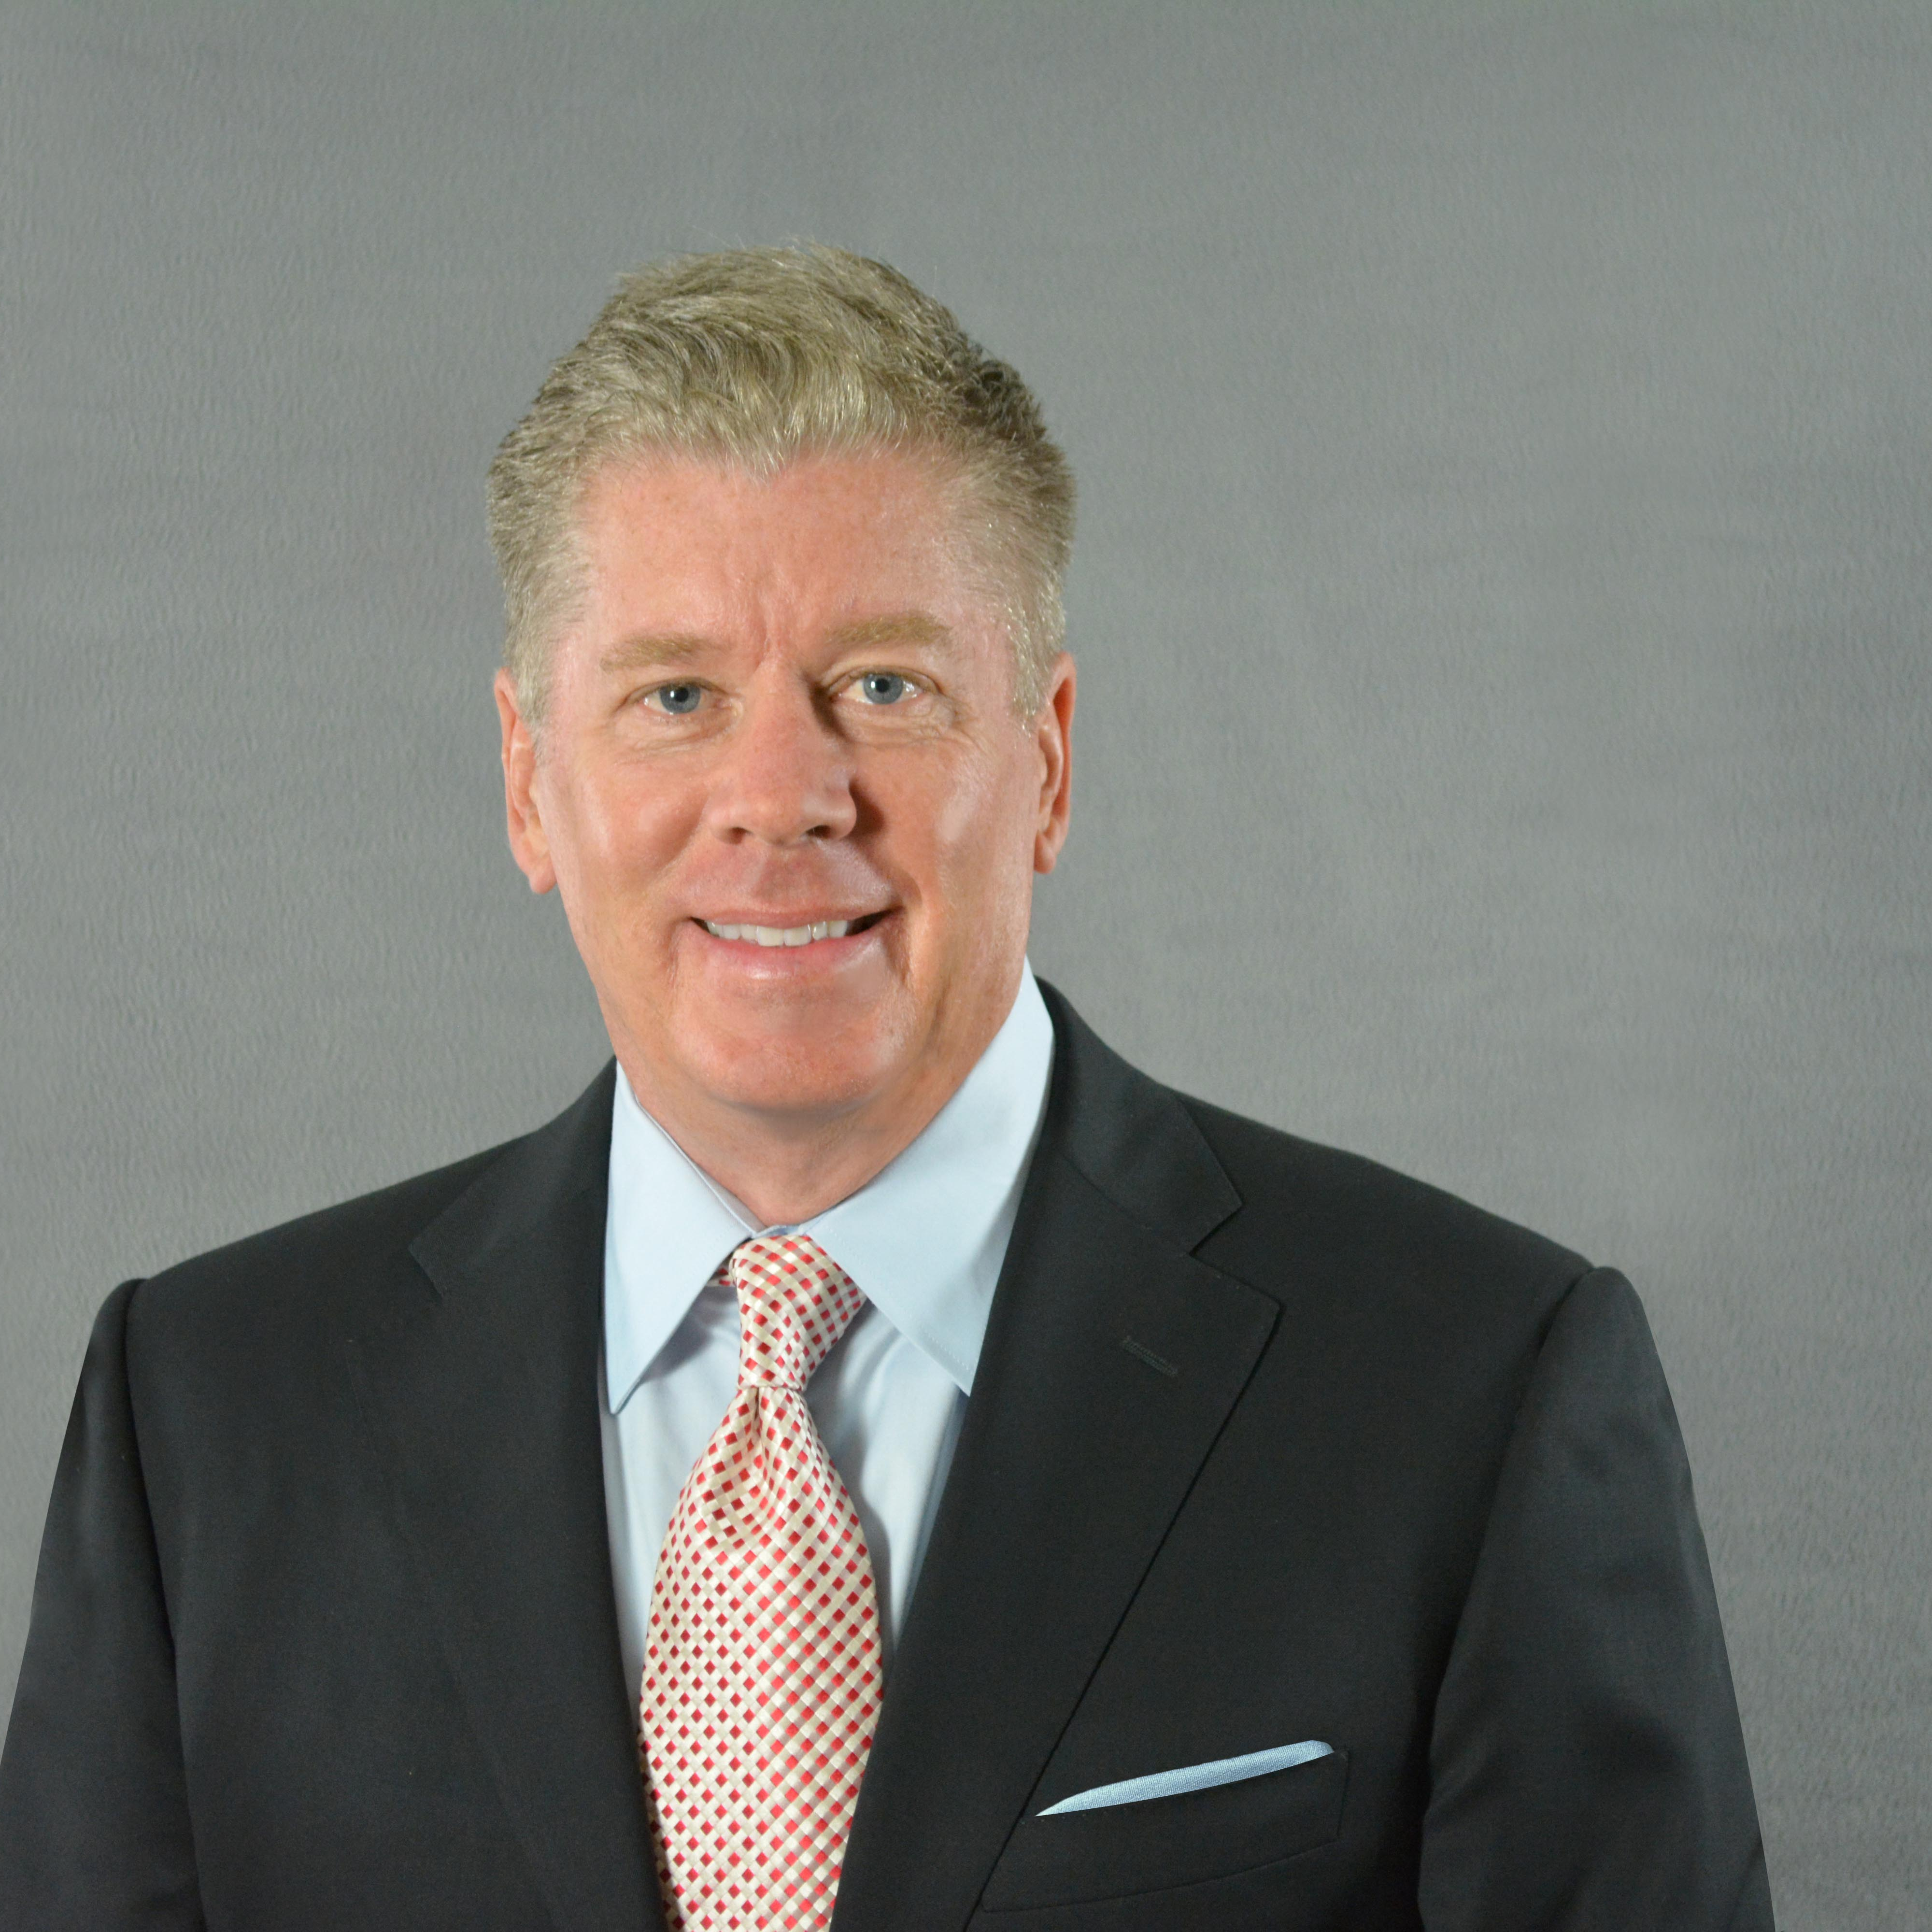 Chris Martin, Executive Vice President at Precept Group